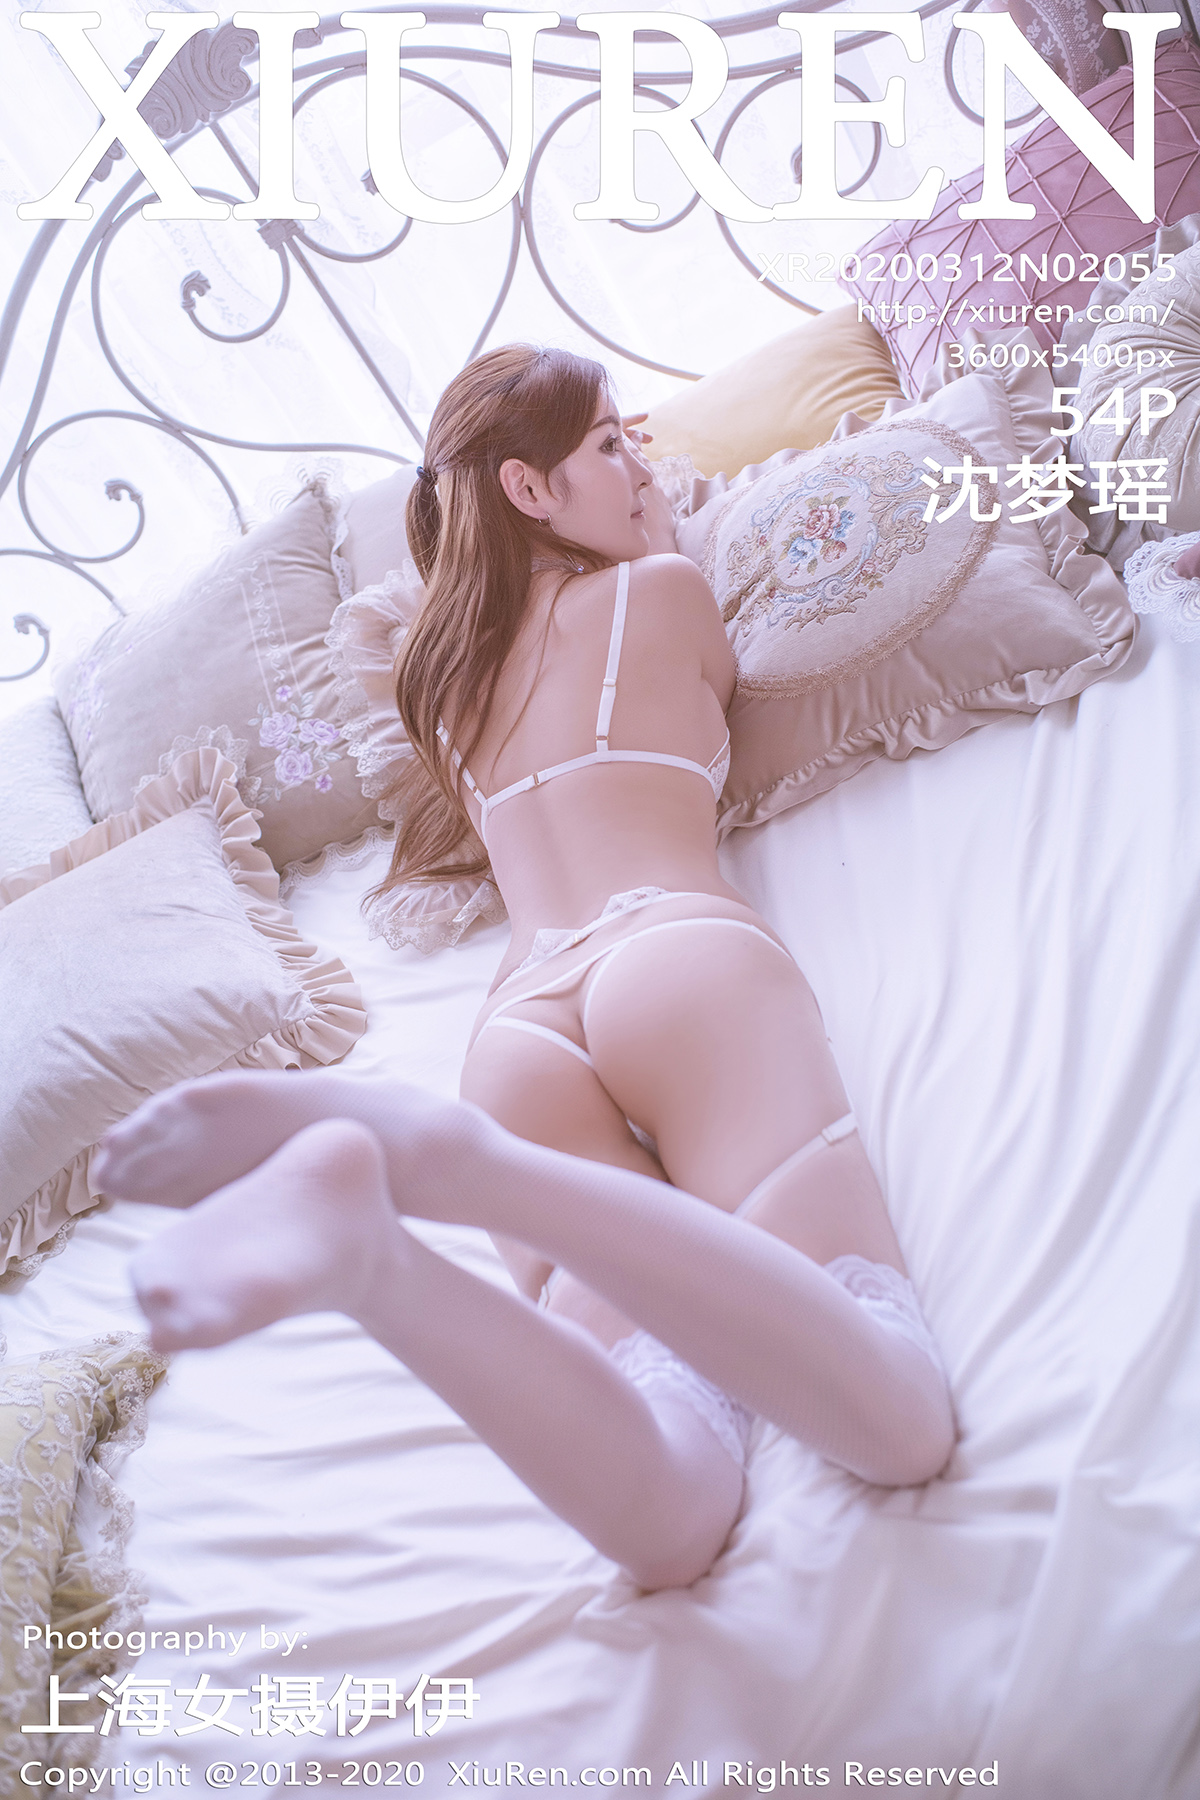 [XiuRen秀人网]2020.03.12 No.2055 沈梦瑶 梦幻 内衣[/212MB]